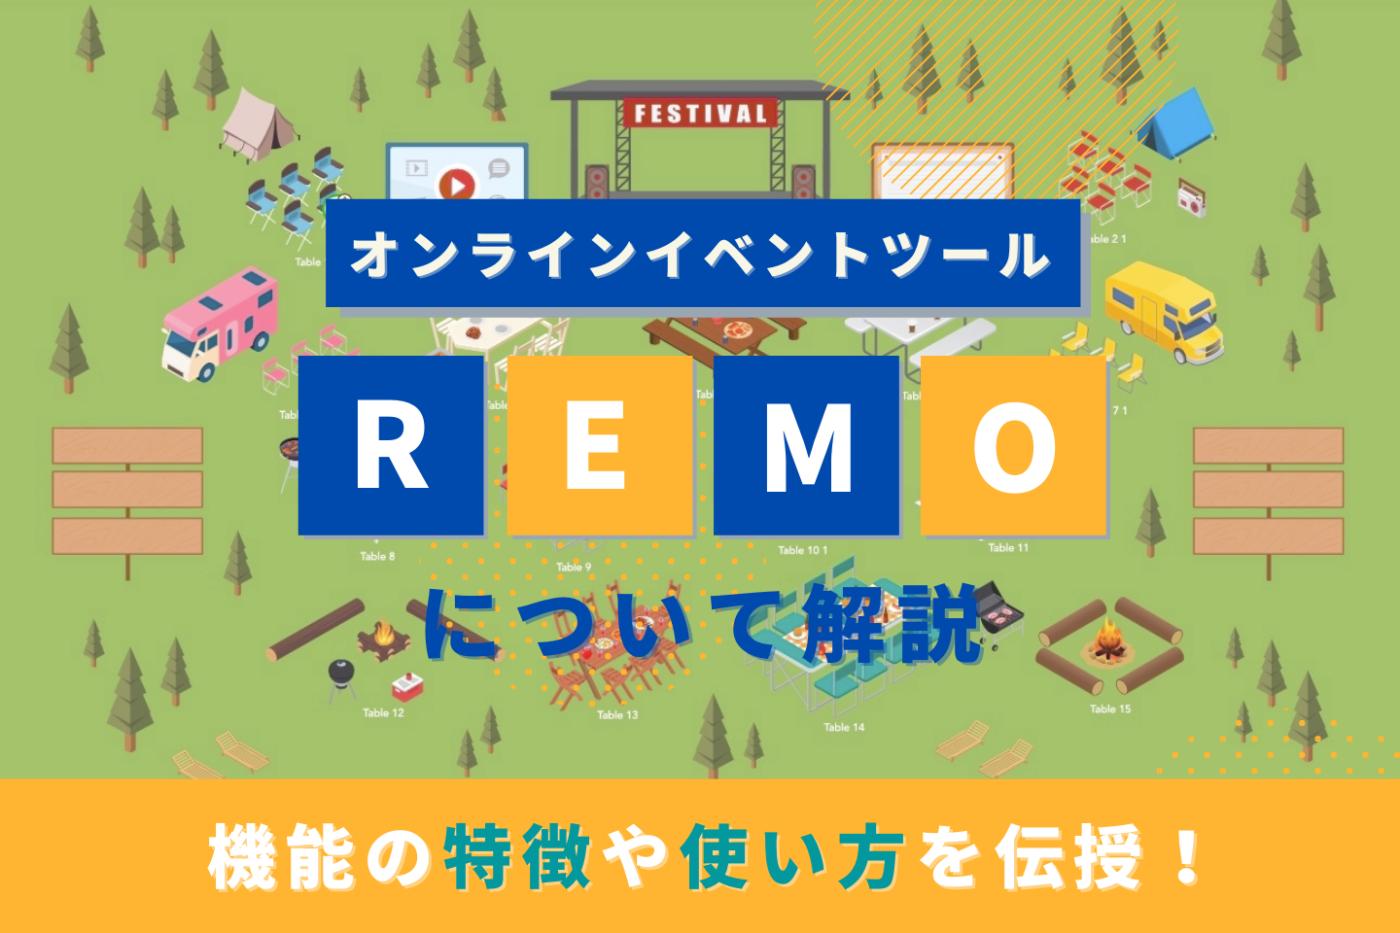 Remo(リモ)とは?機能の特徴や価格、使い方をわかりやすく伝授!